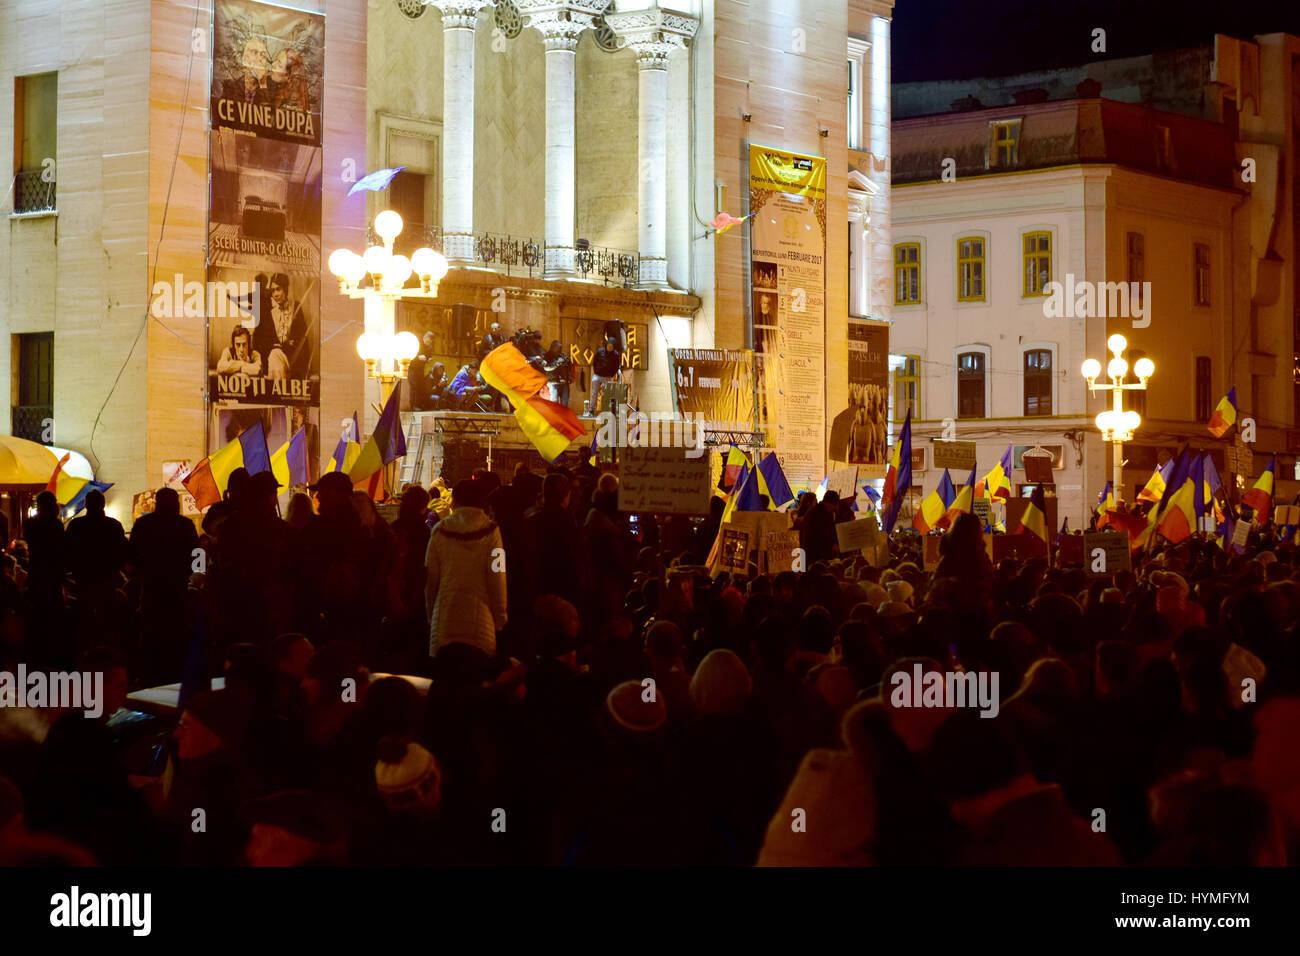 Protesters In Operei Square in Timisoara - Stock Image